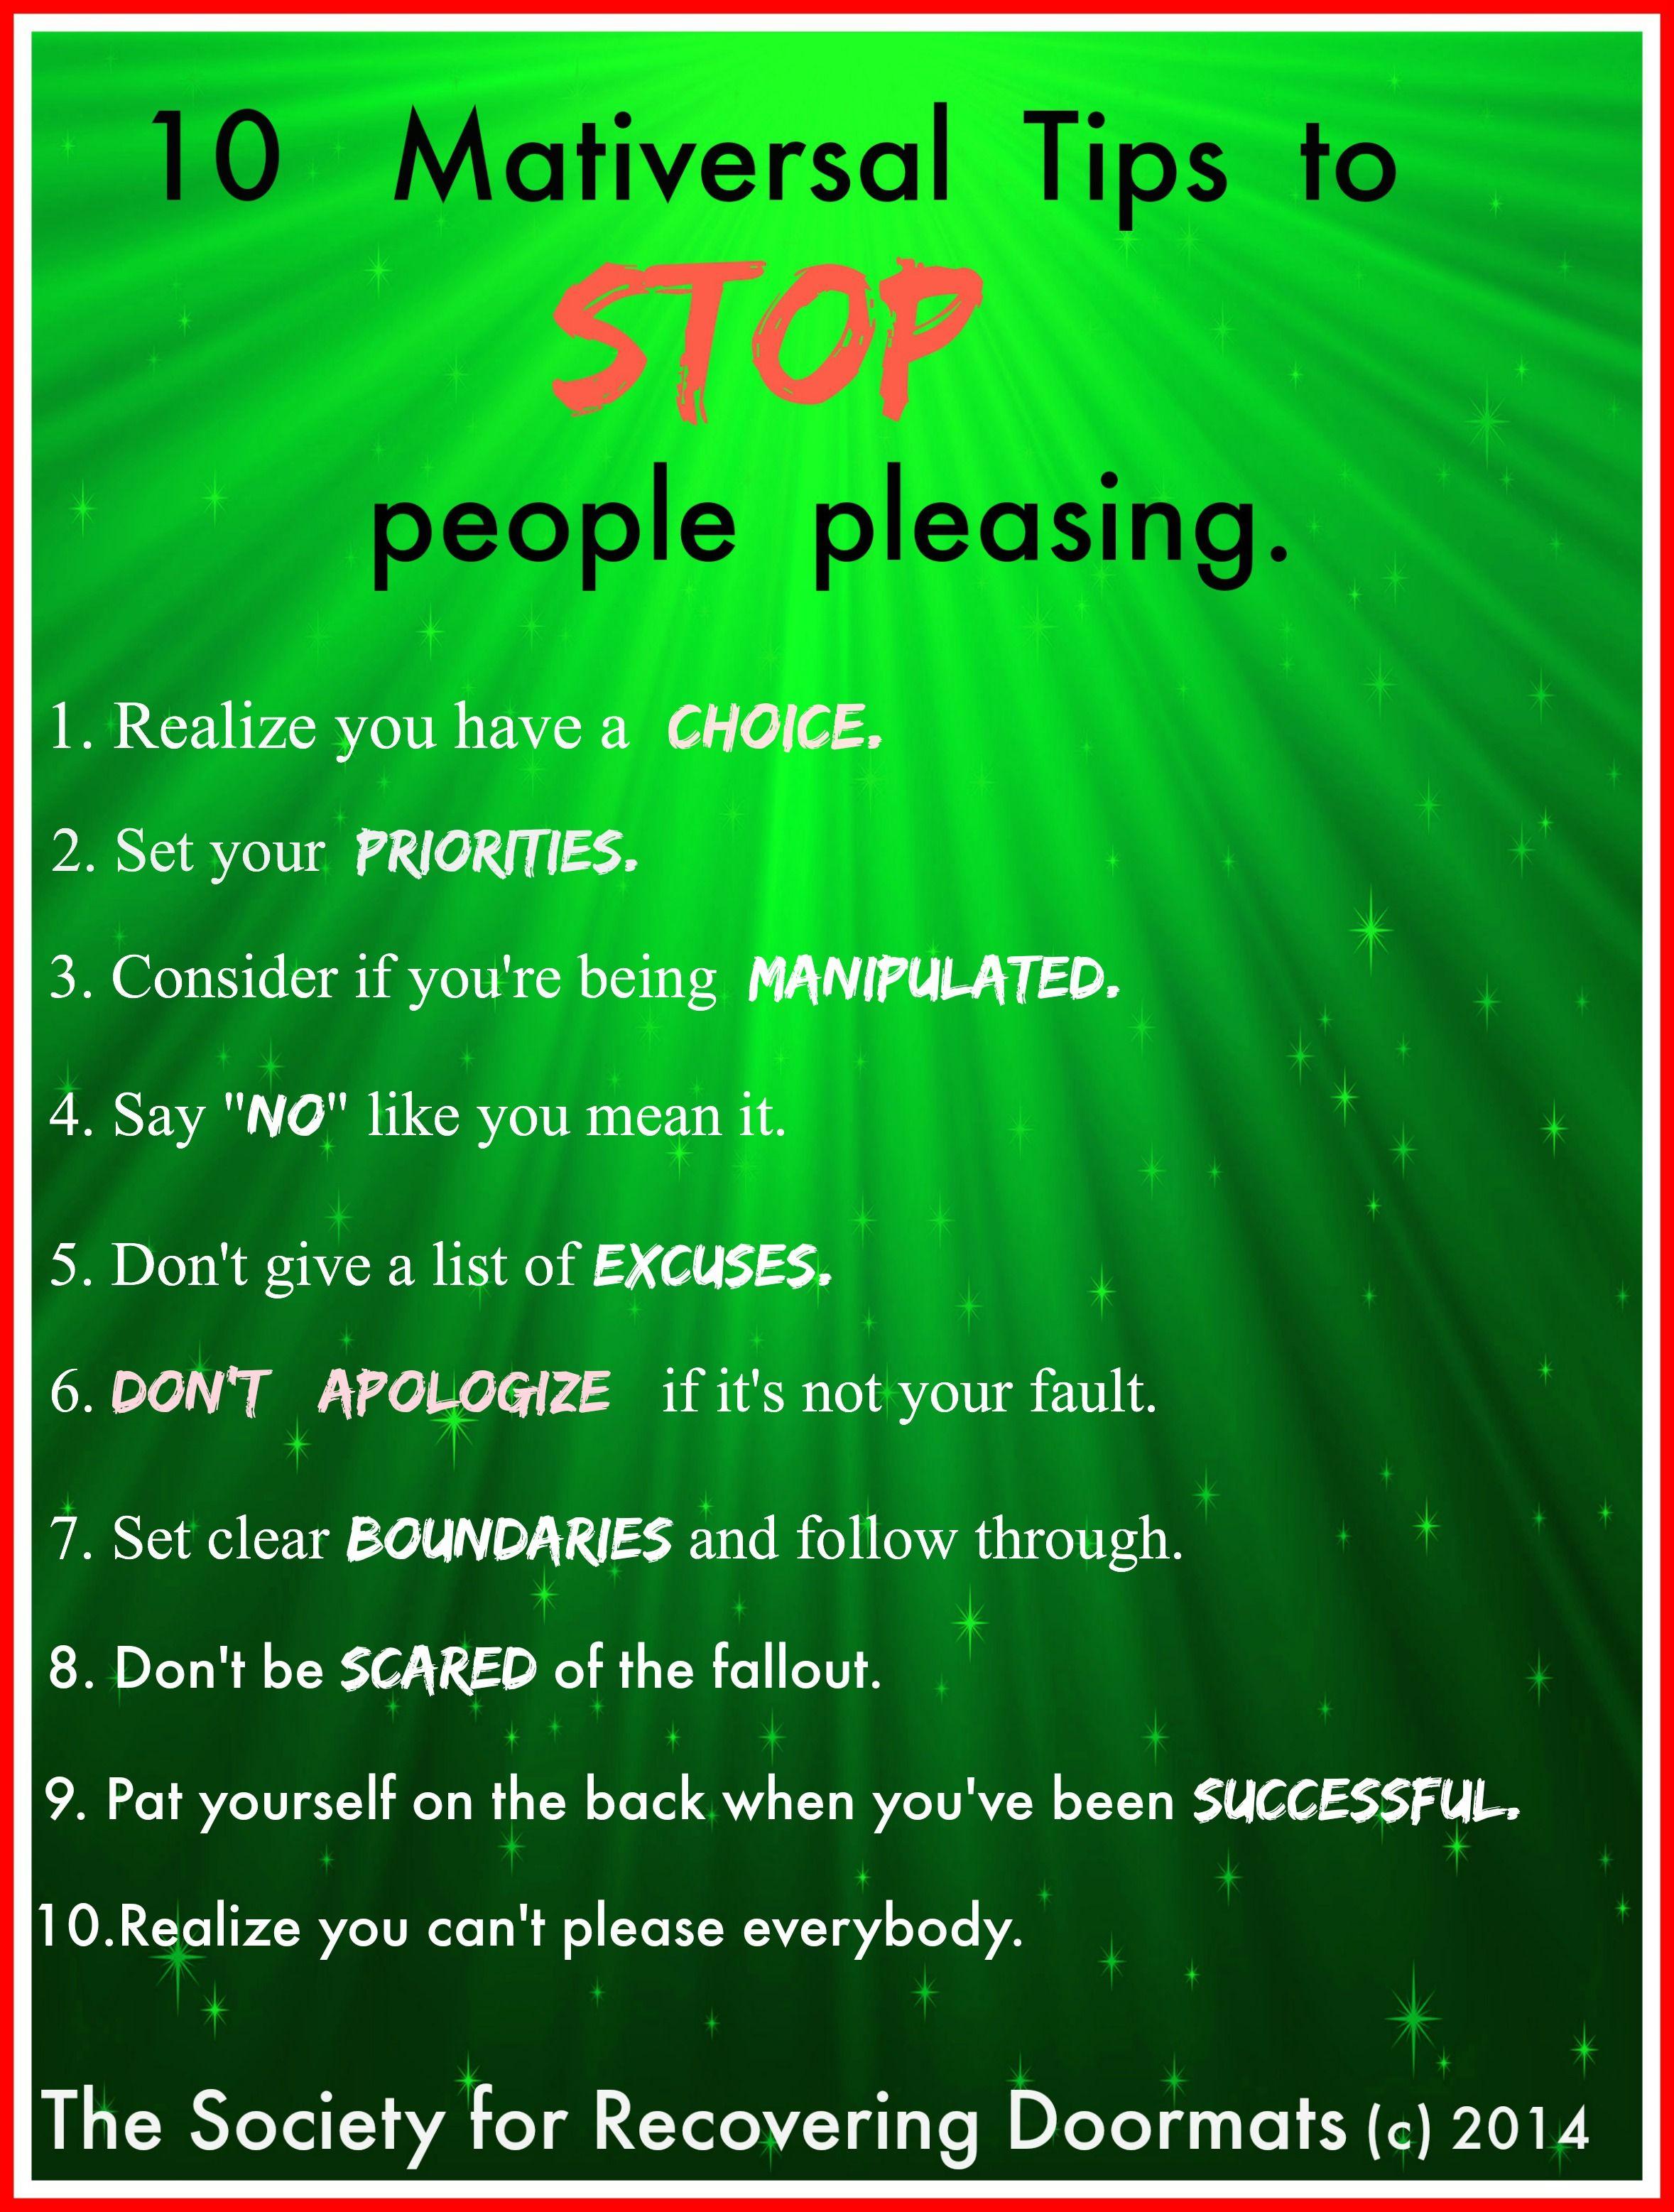 10 Maativersal Tips To Stop People Pleasing